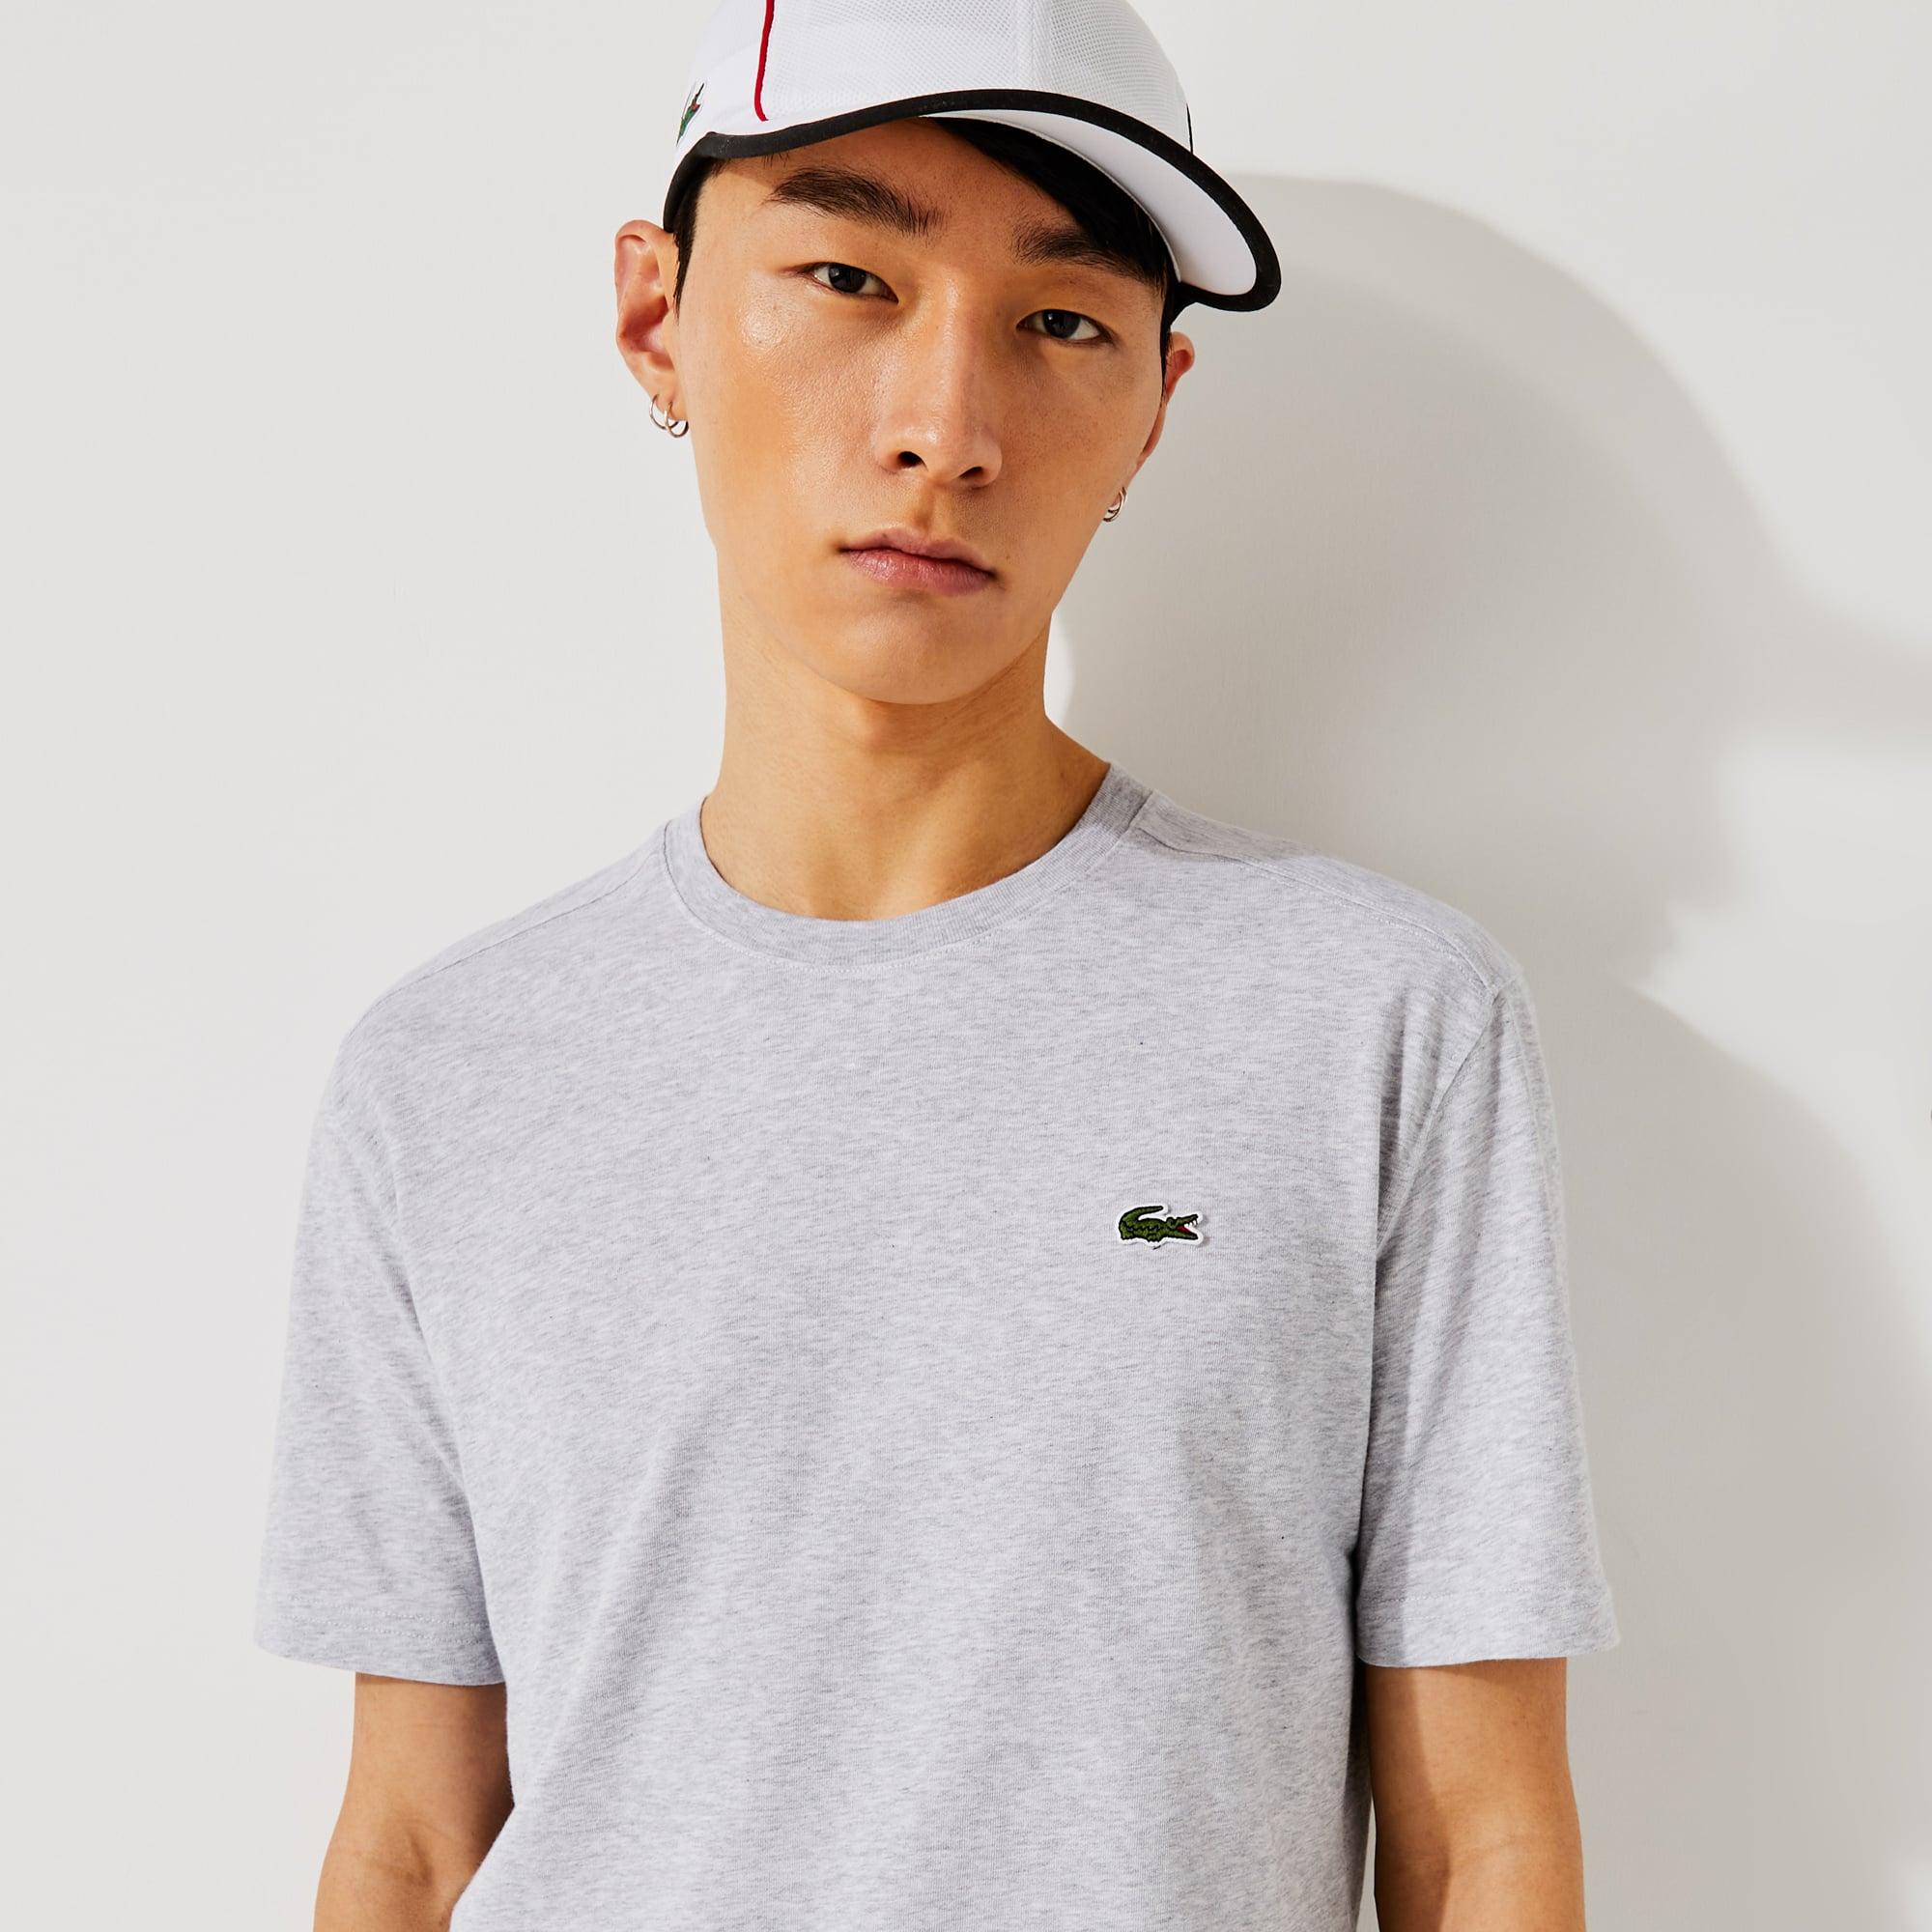 Men's SPORT Crew Neck Tennis T-Shirt